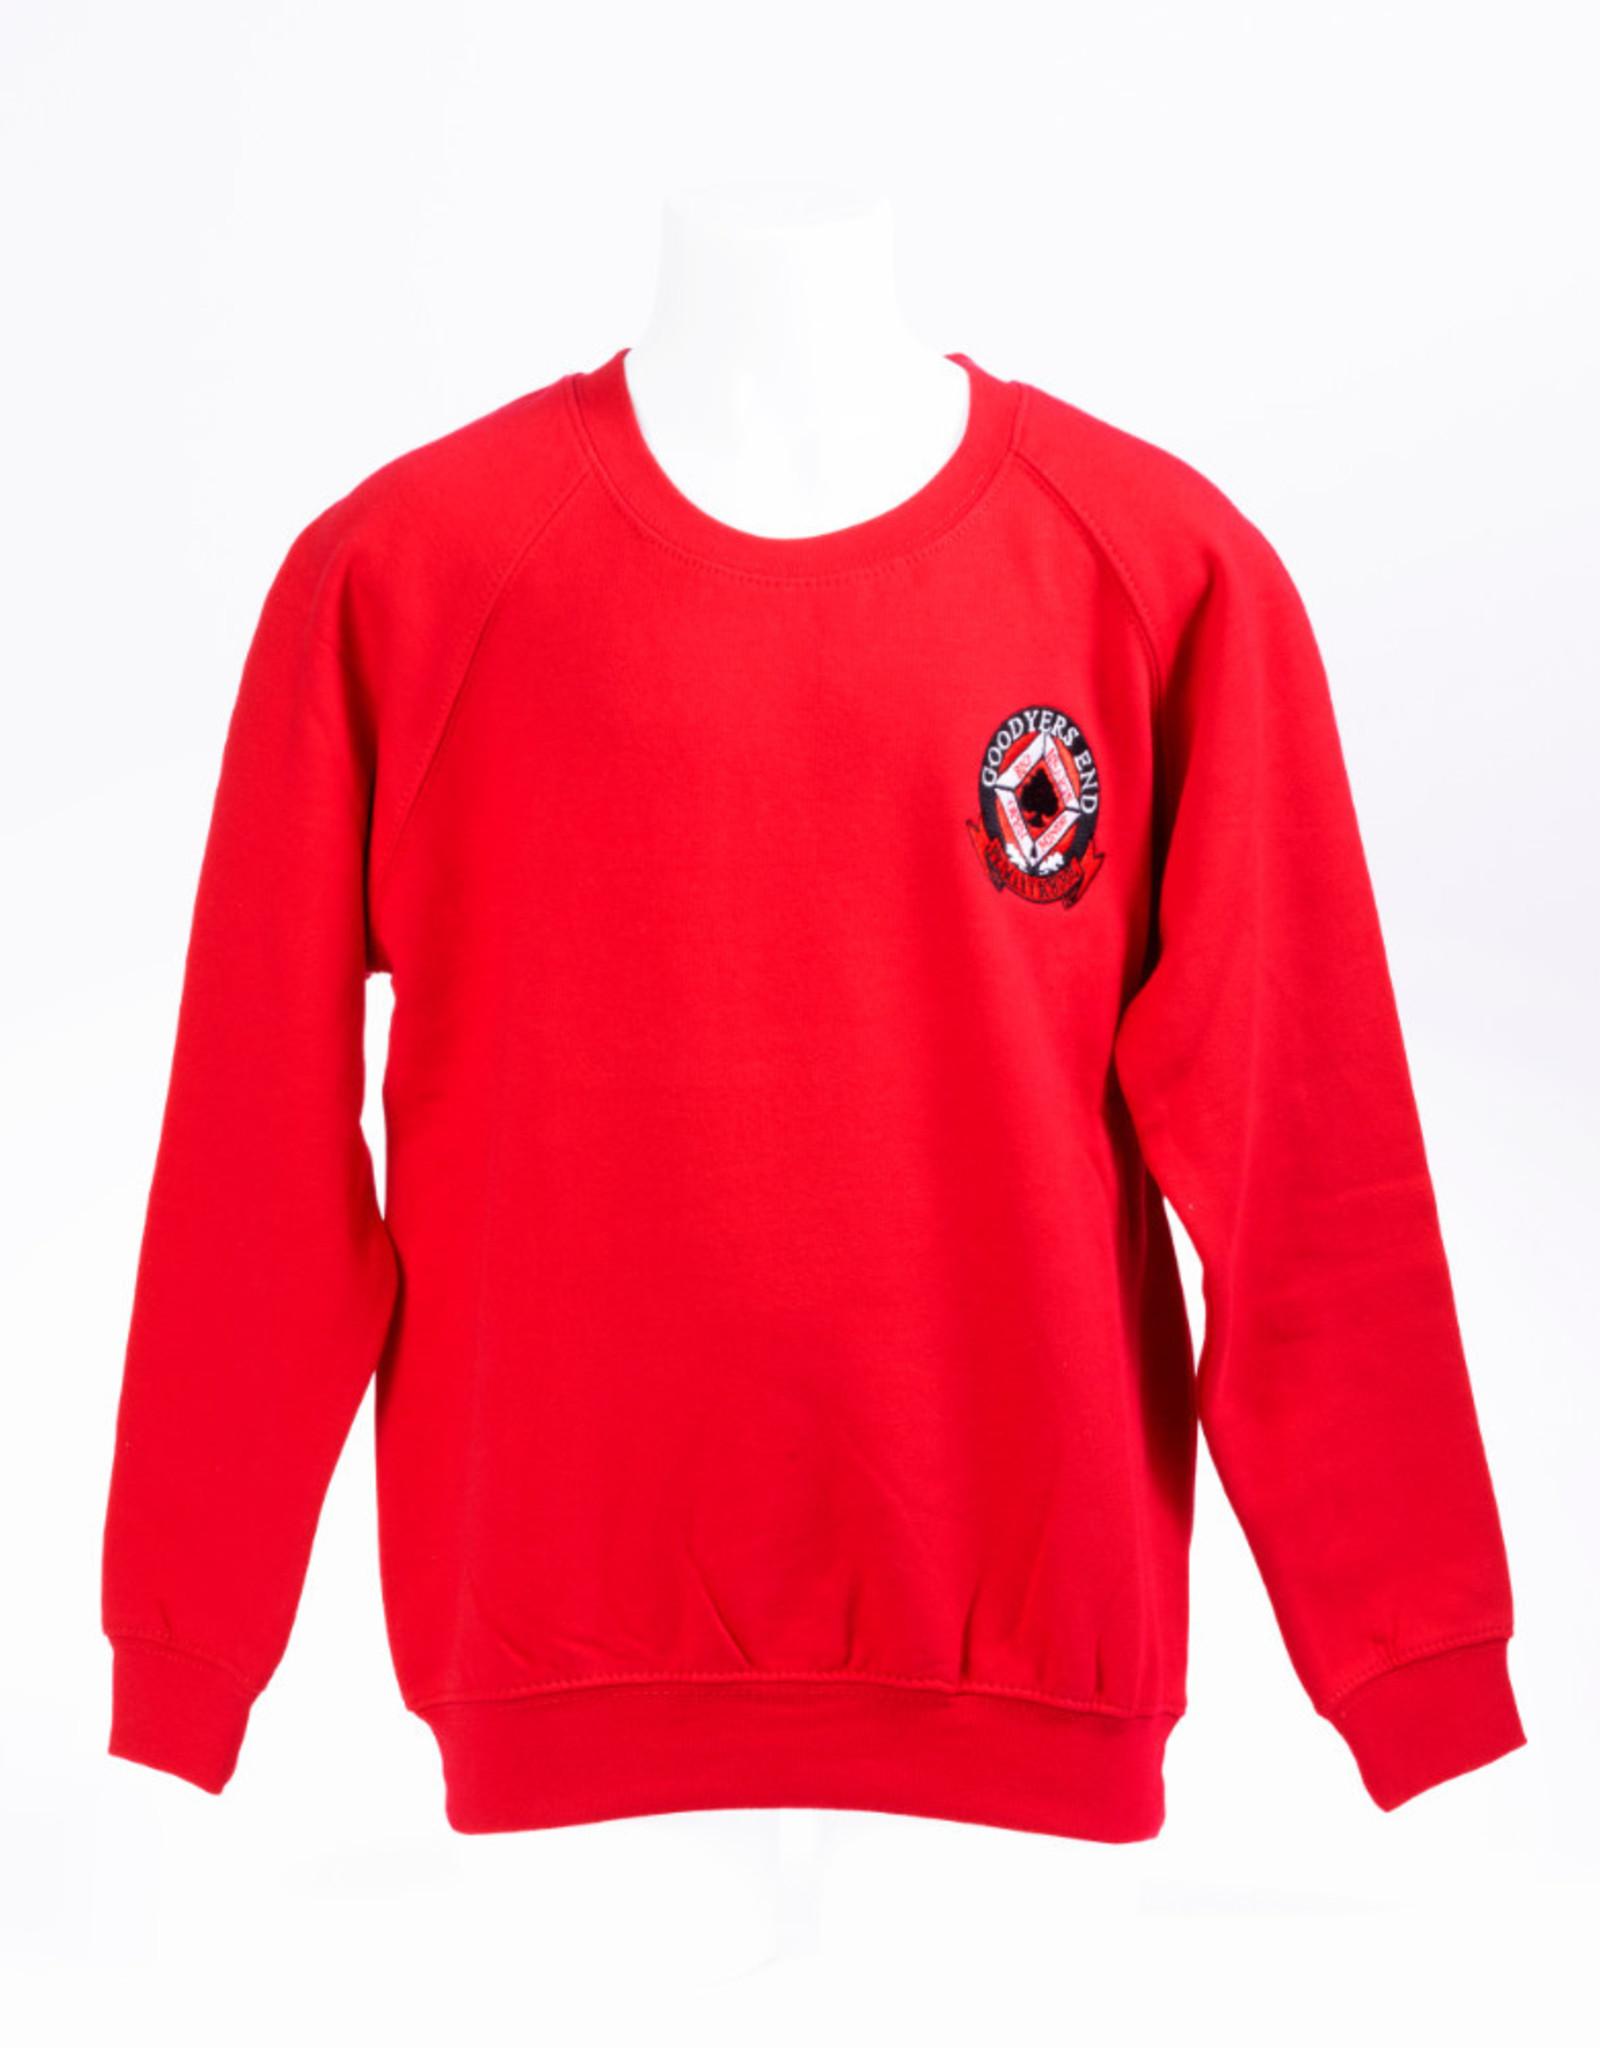 Sweatshirt Child Size - Goodyers End School